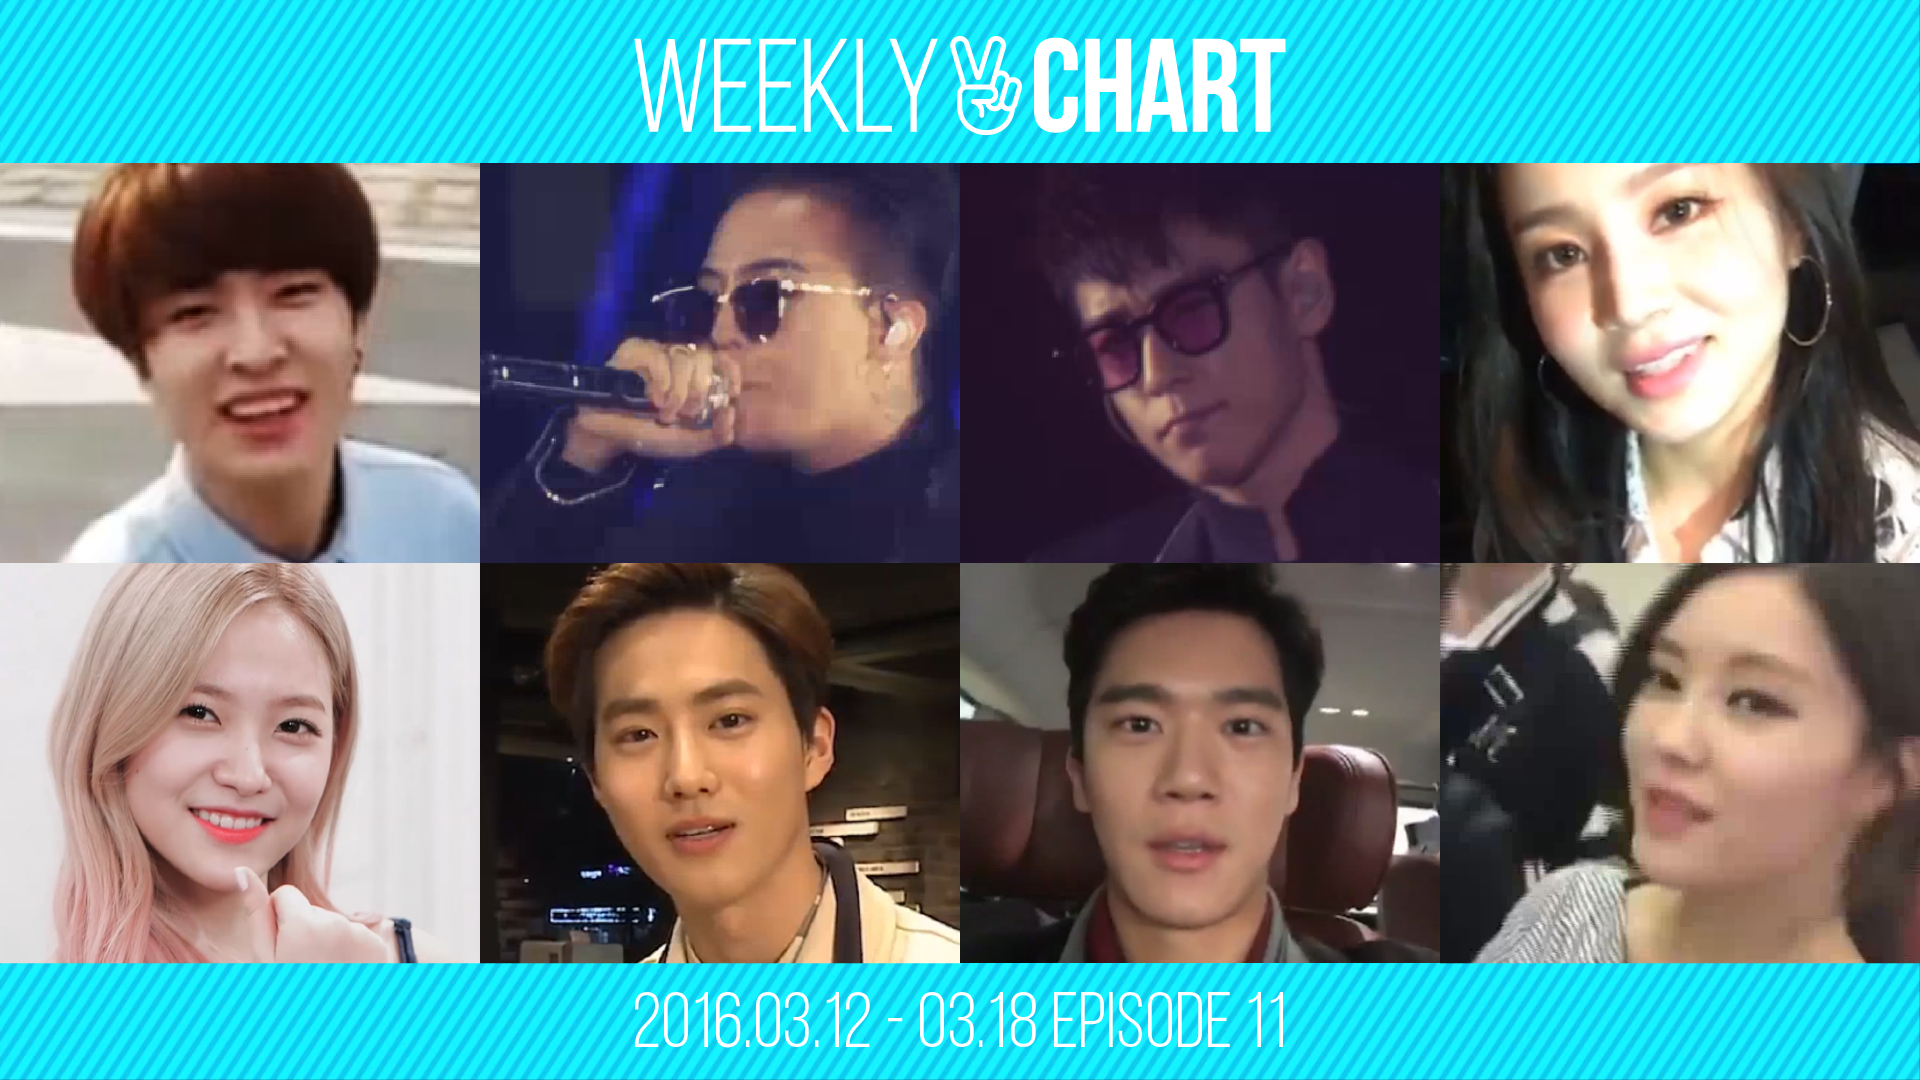 [WEEKLY V CHART] 2016.3.12- 3.18 EPISODE